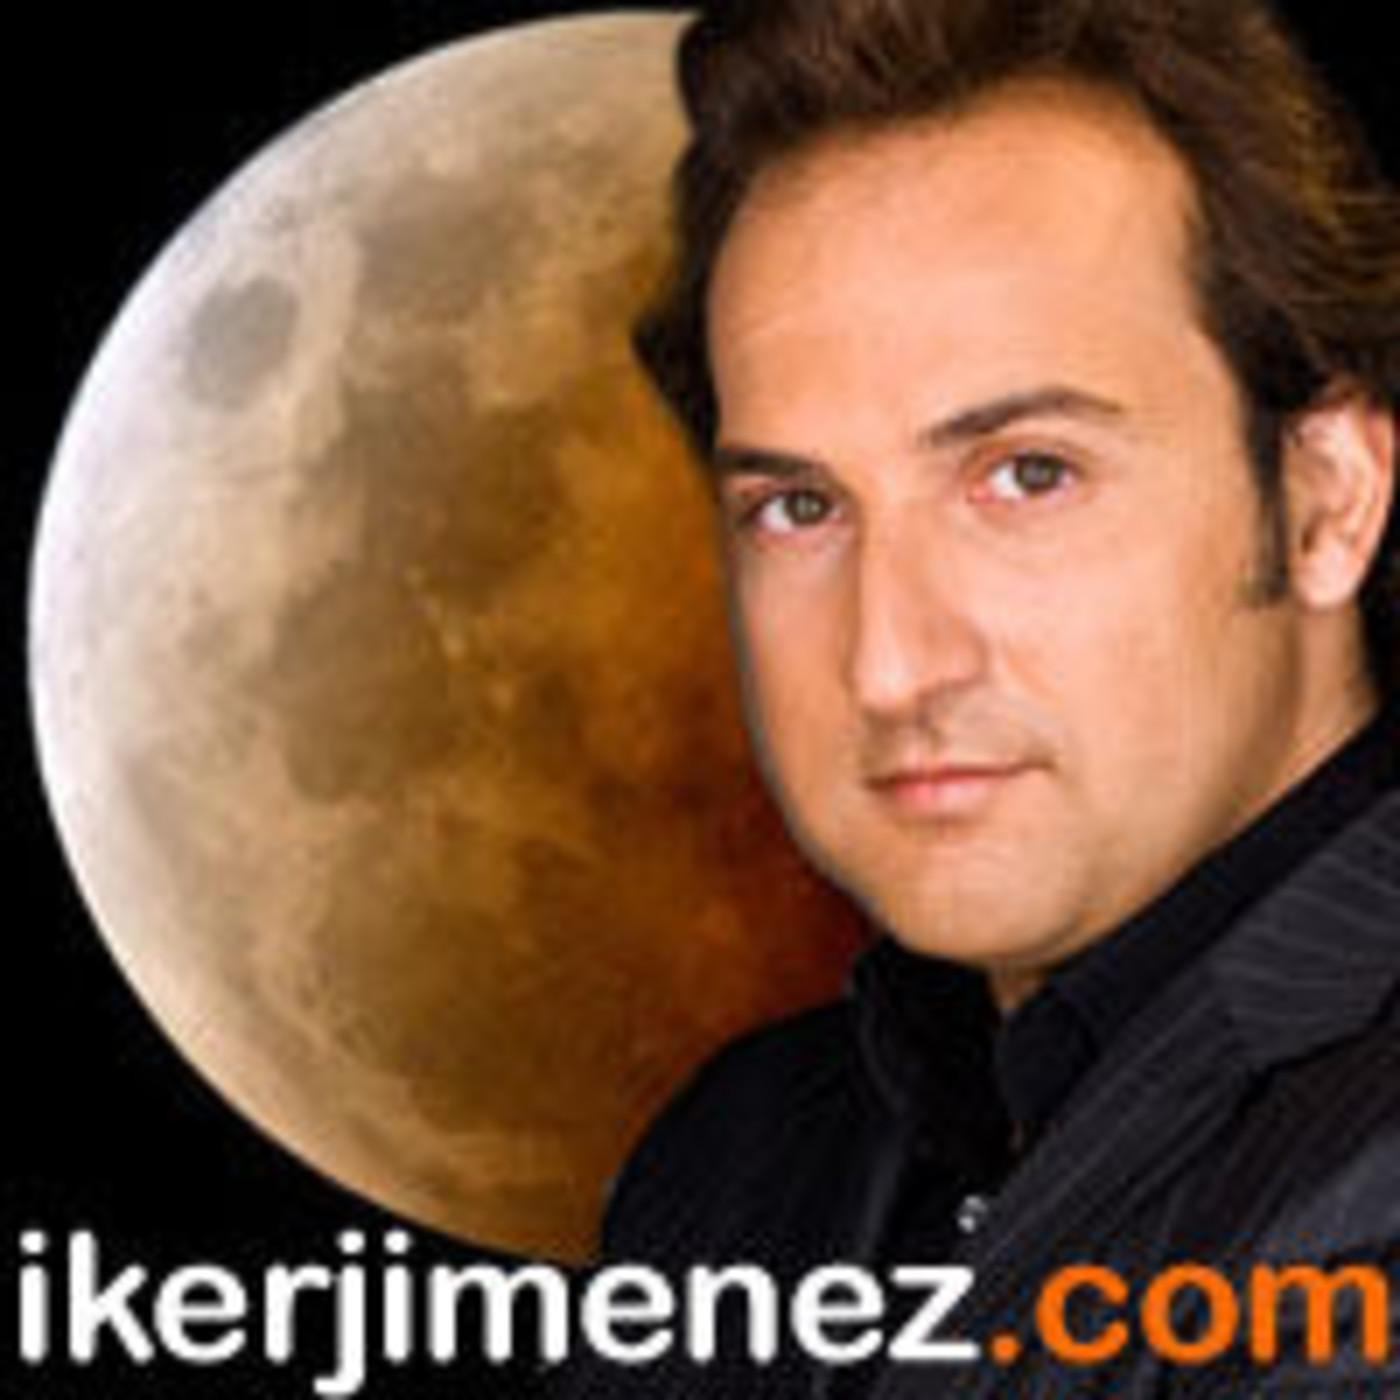 Milenio3 - 13x13 - La noche más oscura - 1/12/2013 - Pgm completo ...